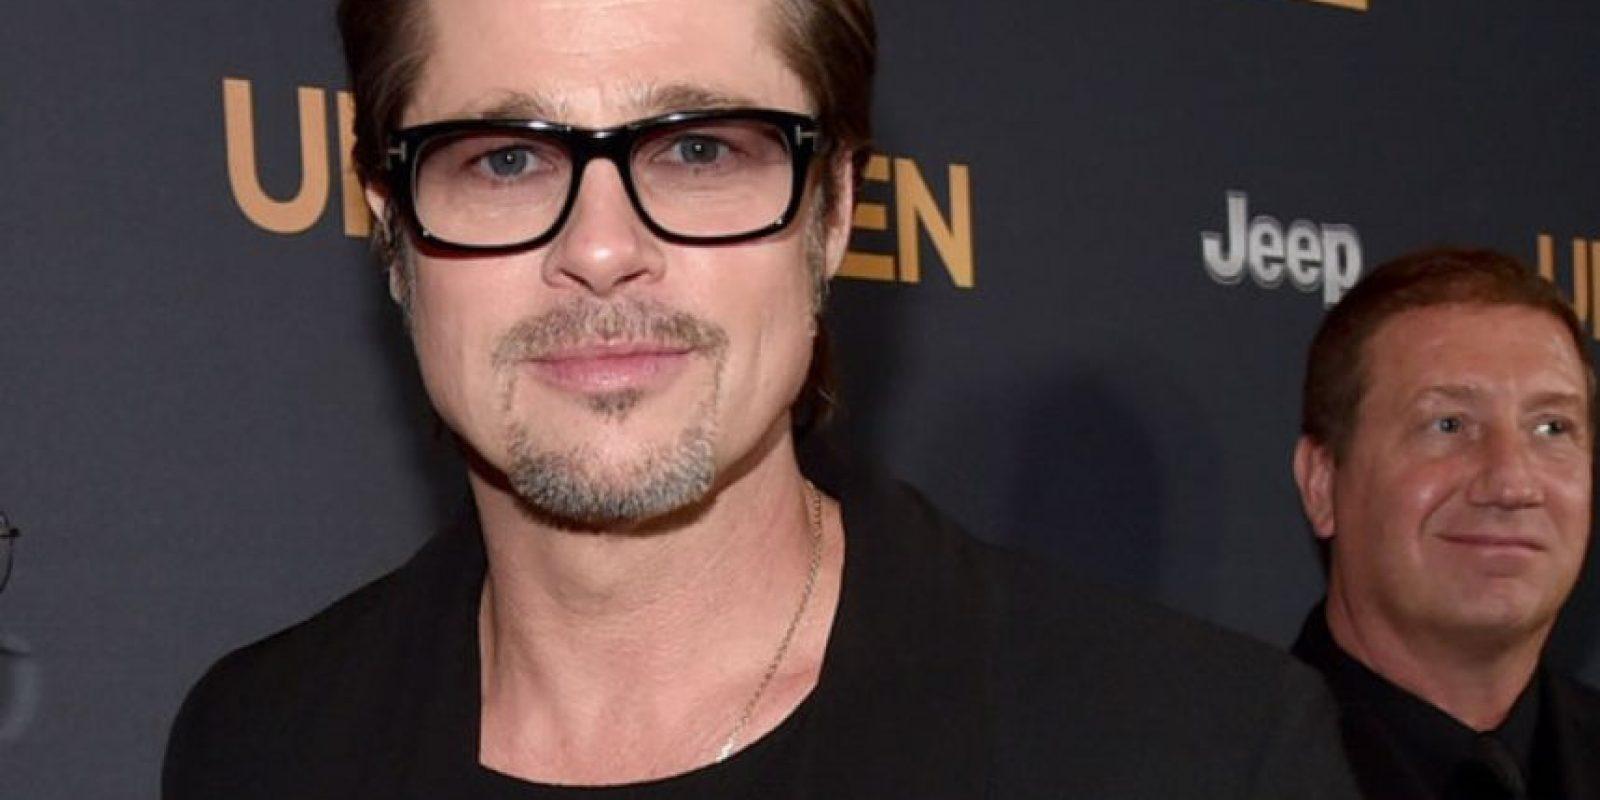 A Brad Pitt rara vez se le ve con el cabello largo. Foto:Getty Images